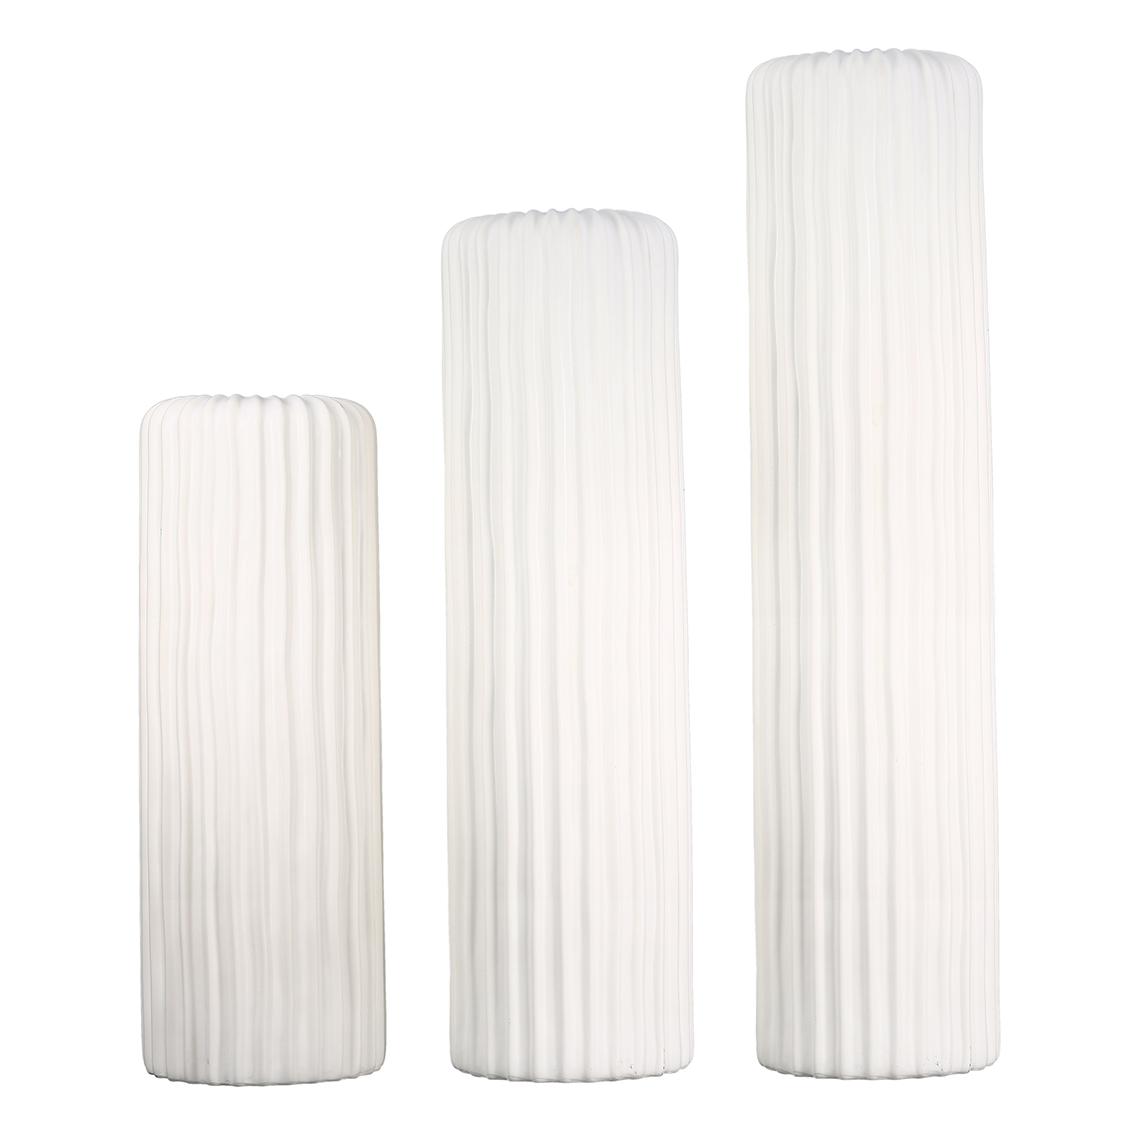 Porcelánová váza Elias, 76 cm, bílá